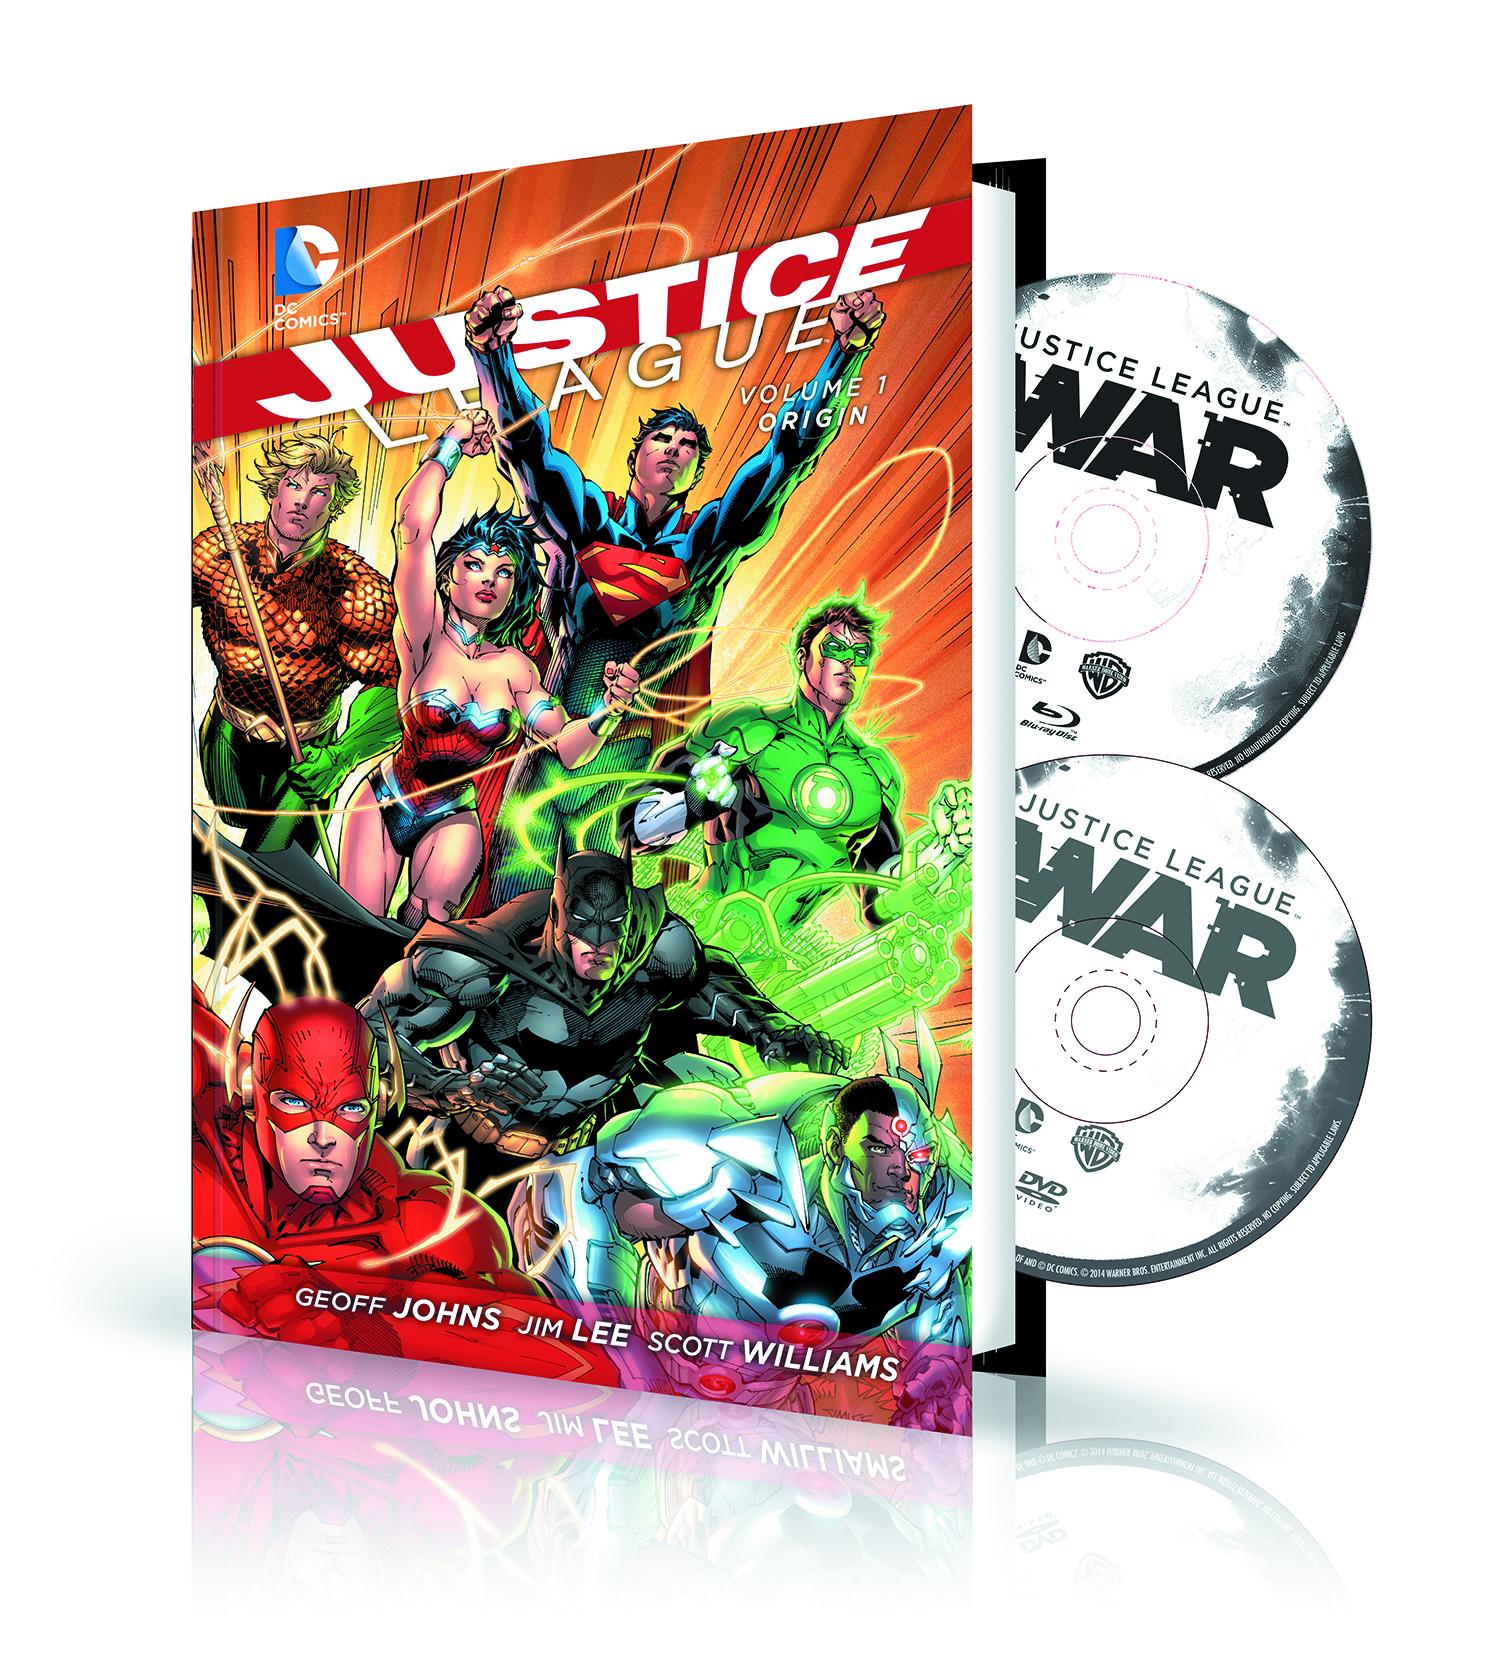 justice league vol 1 pdf